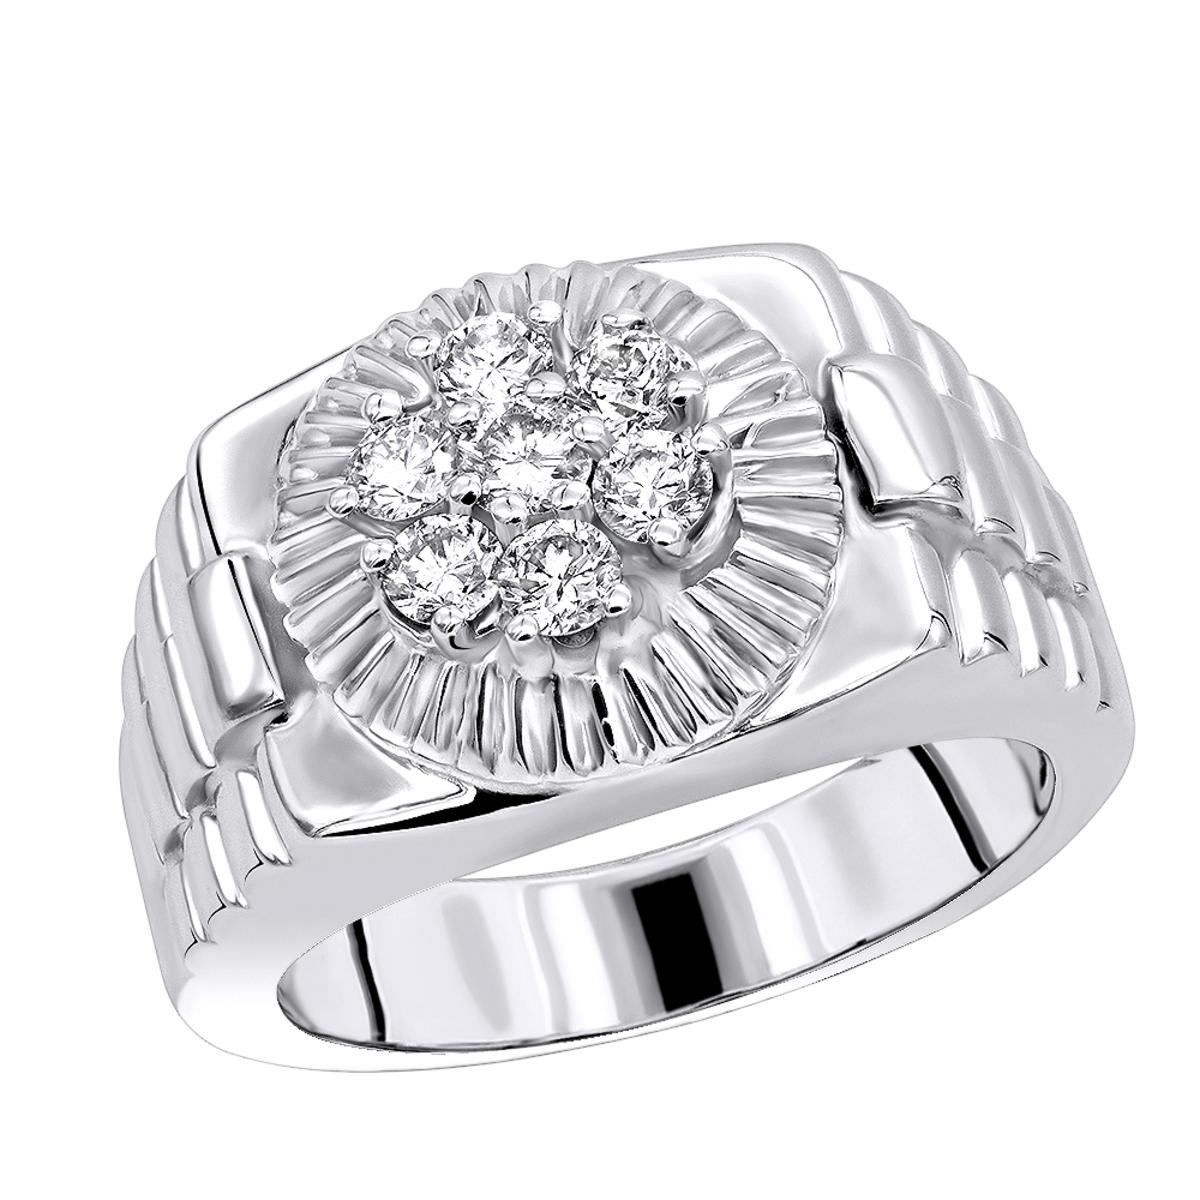 Mens Rings 14K Gold Rolex Style Mens Diamond Ring .95ct